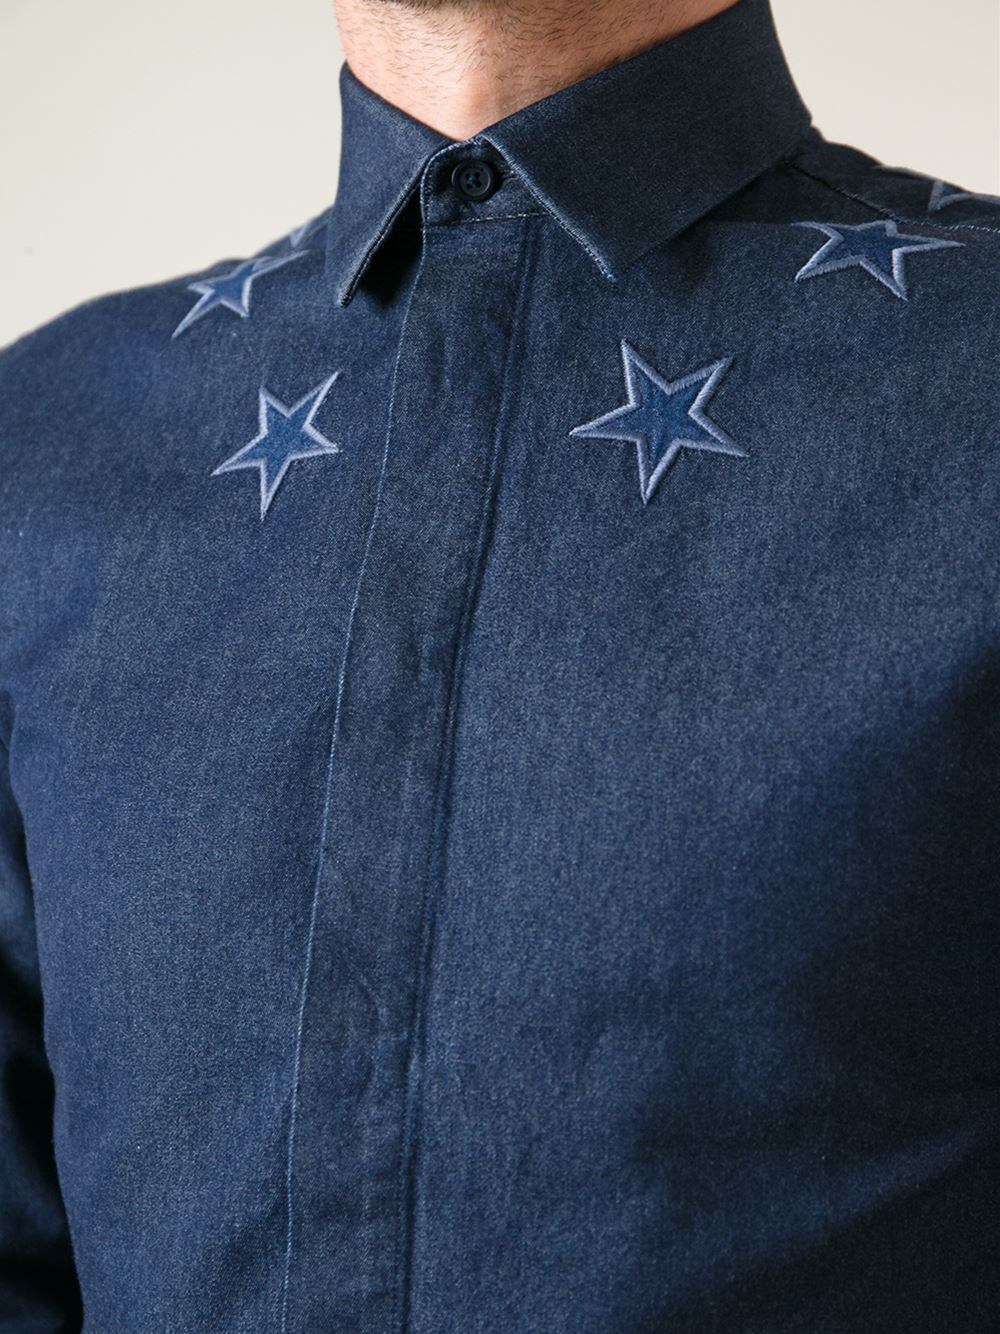 Givenchy star detail shirt shive magazine for Givenchy star t shirt